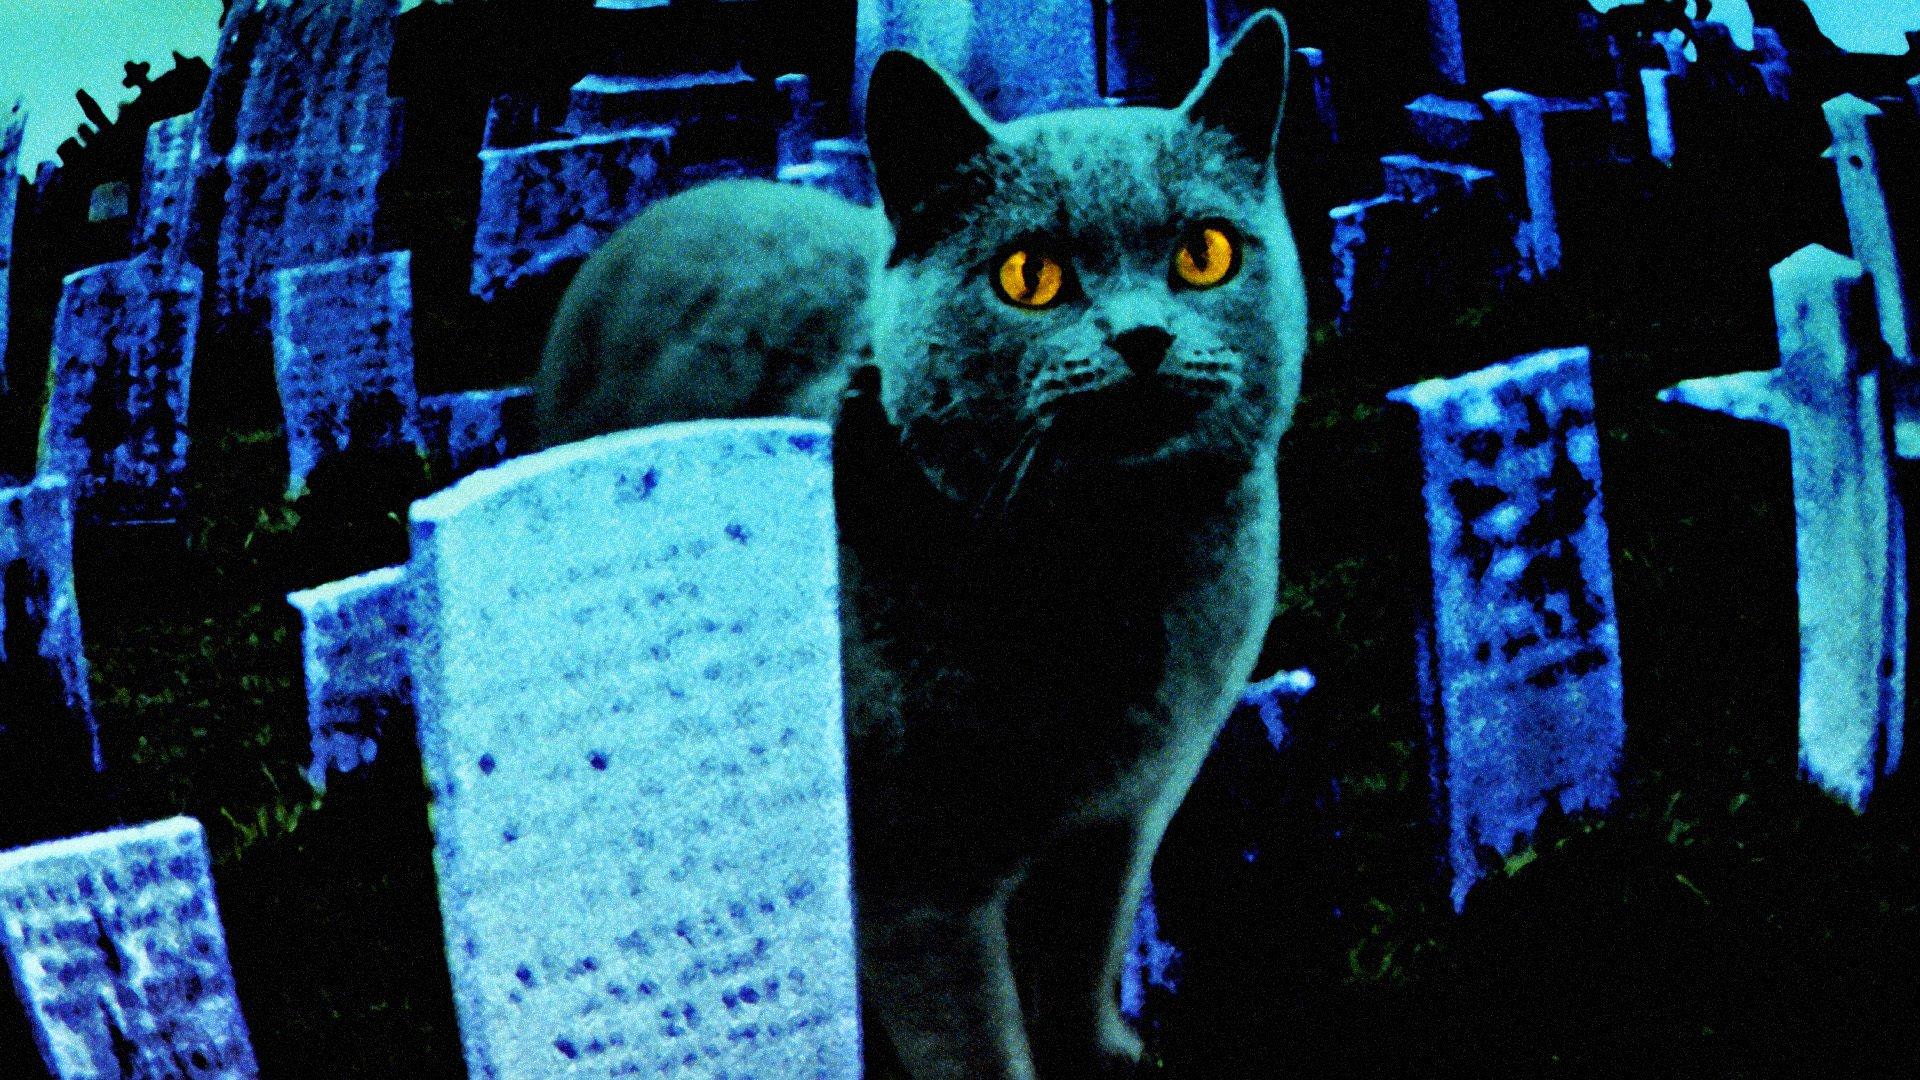 кладбище домашних животных стивен кинг перевод stephen king